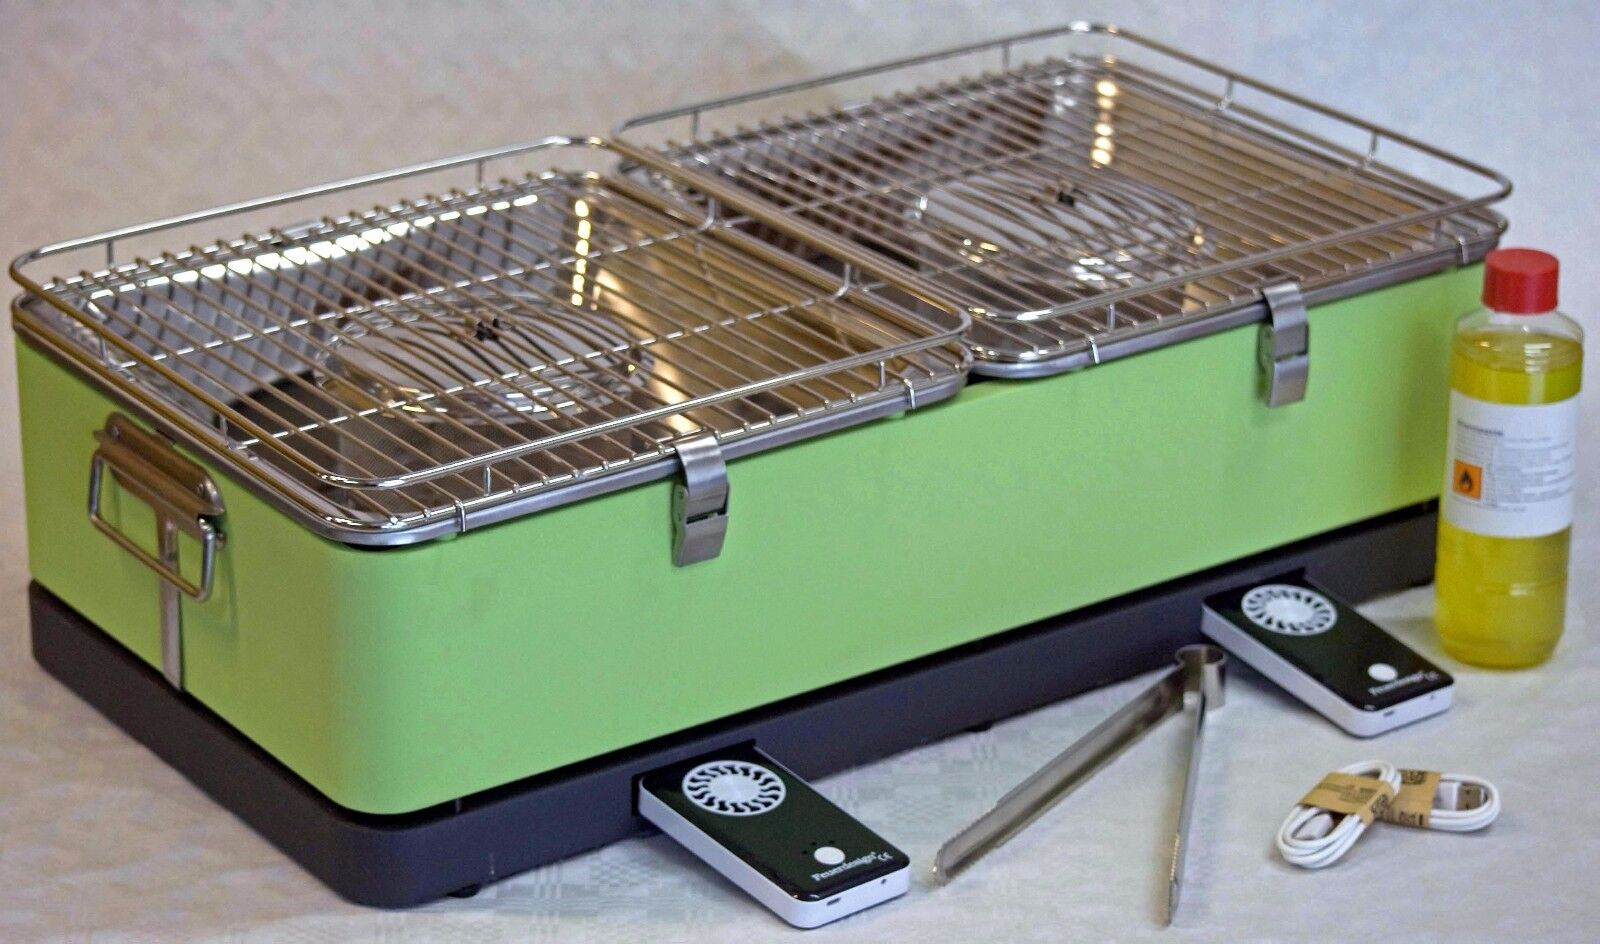 Landmann Holzkohlegrill Grill Lok 11093 : Weber gasgrill b ware outdoor kitchens appliances kitchen kits bbq